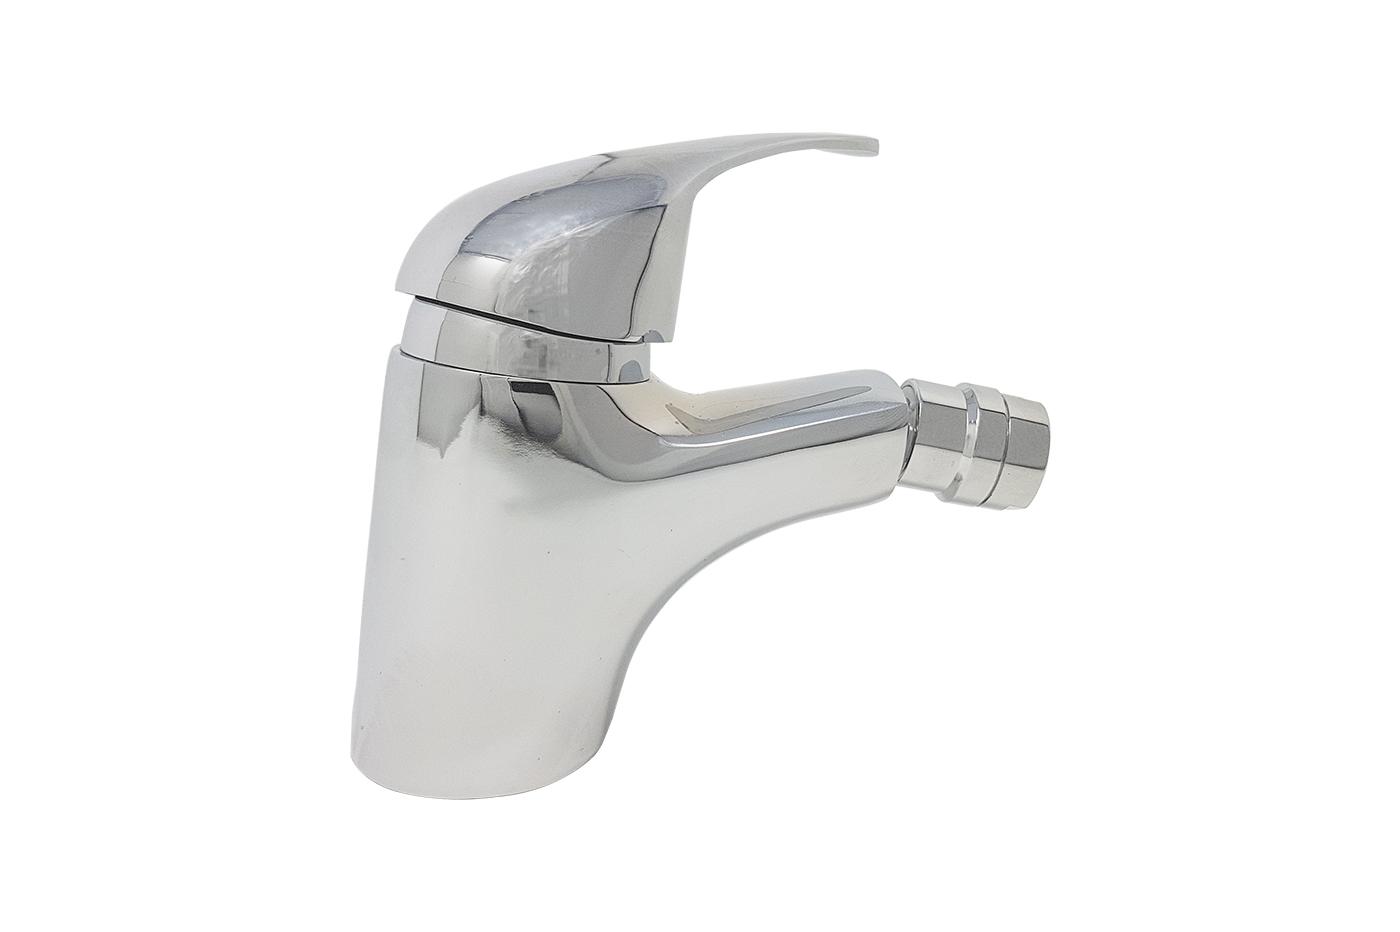 Bes 23728 rubinetteria beselettronica rubinetto miscelatore